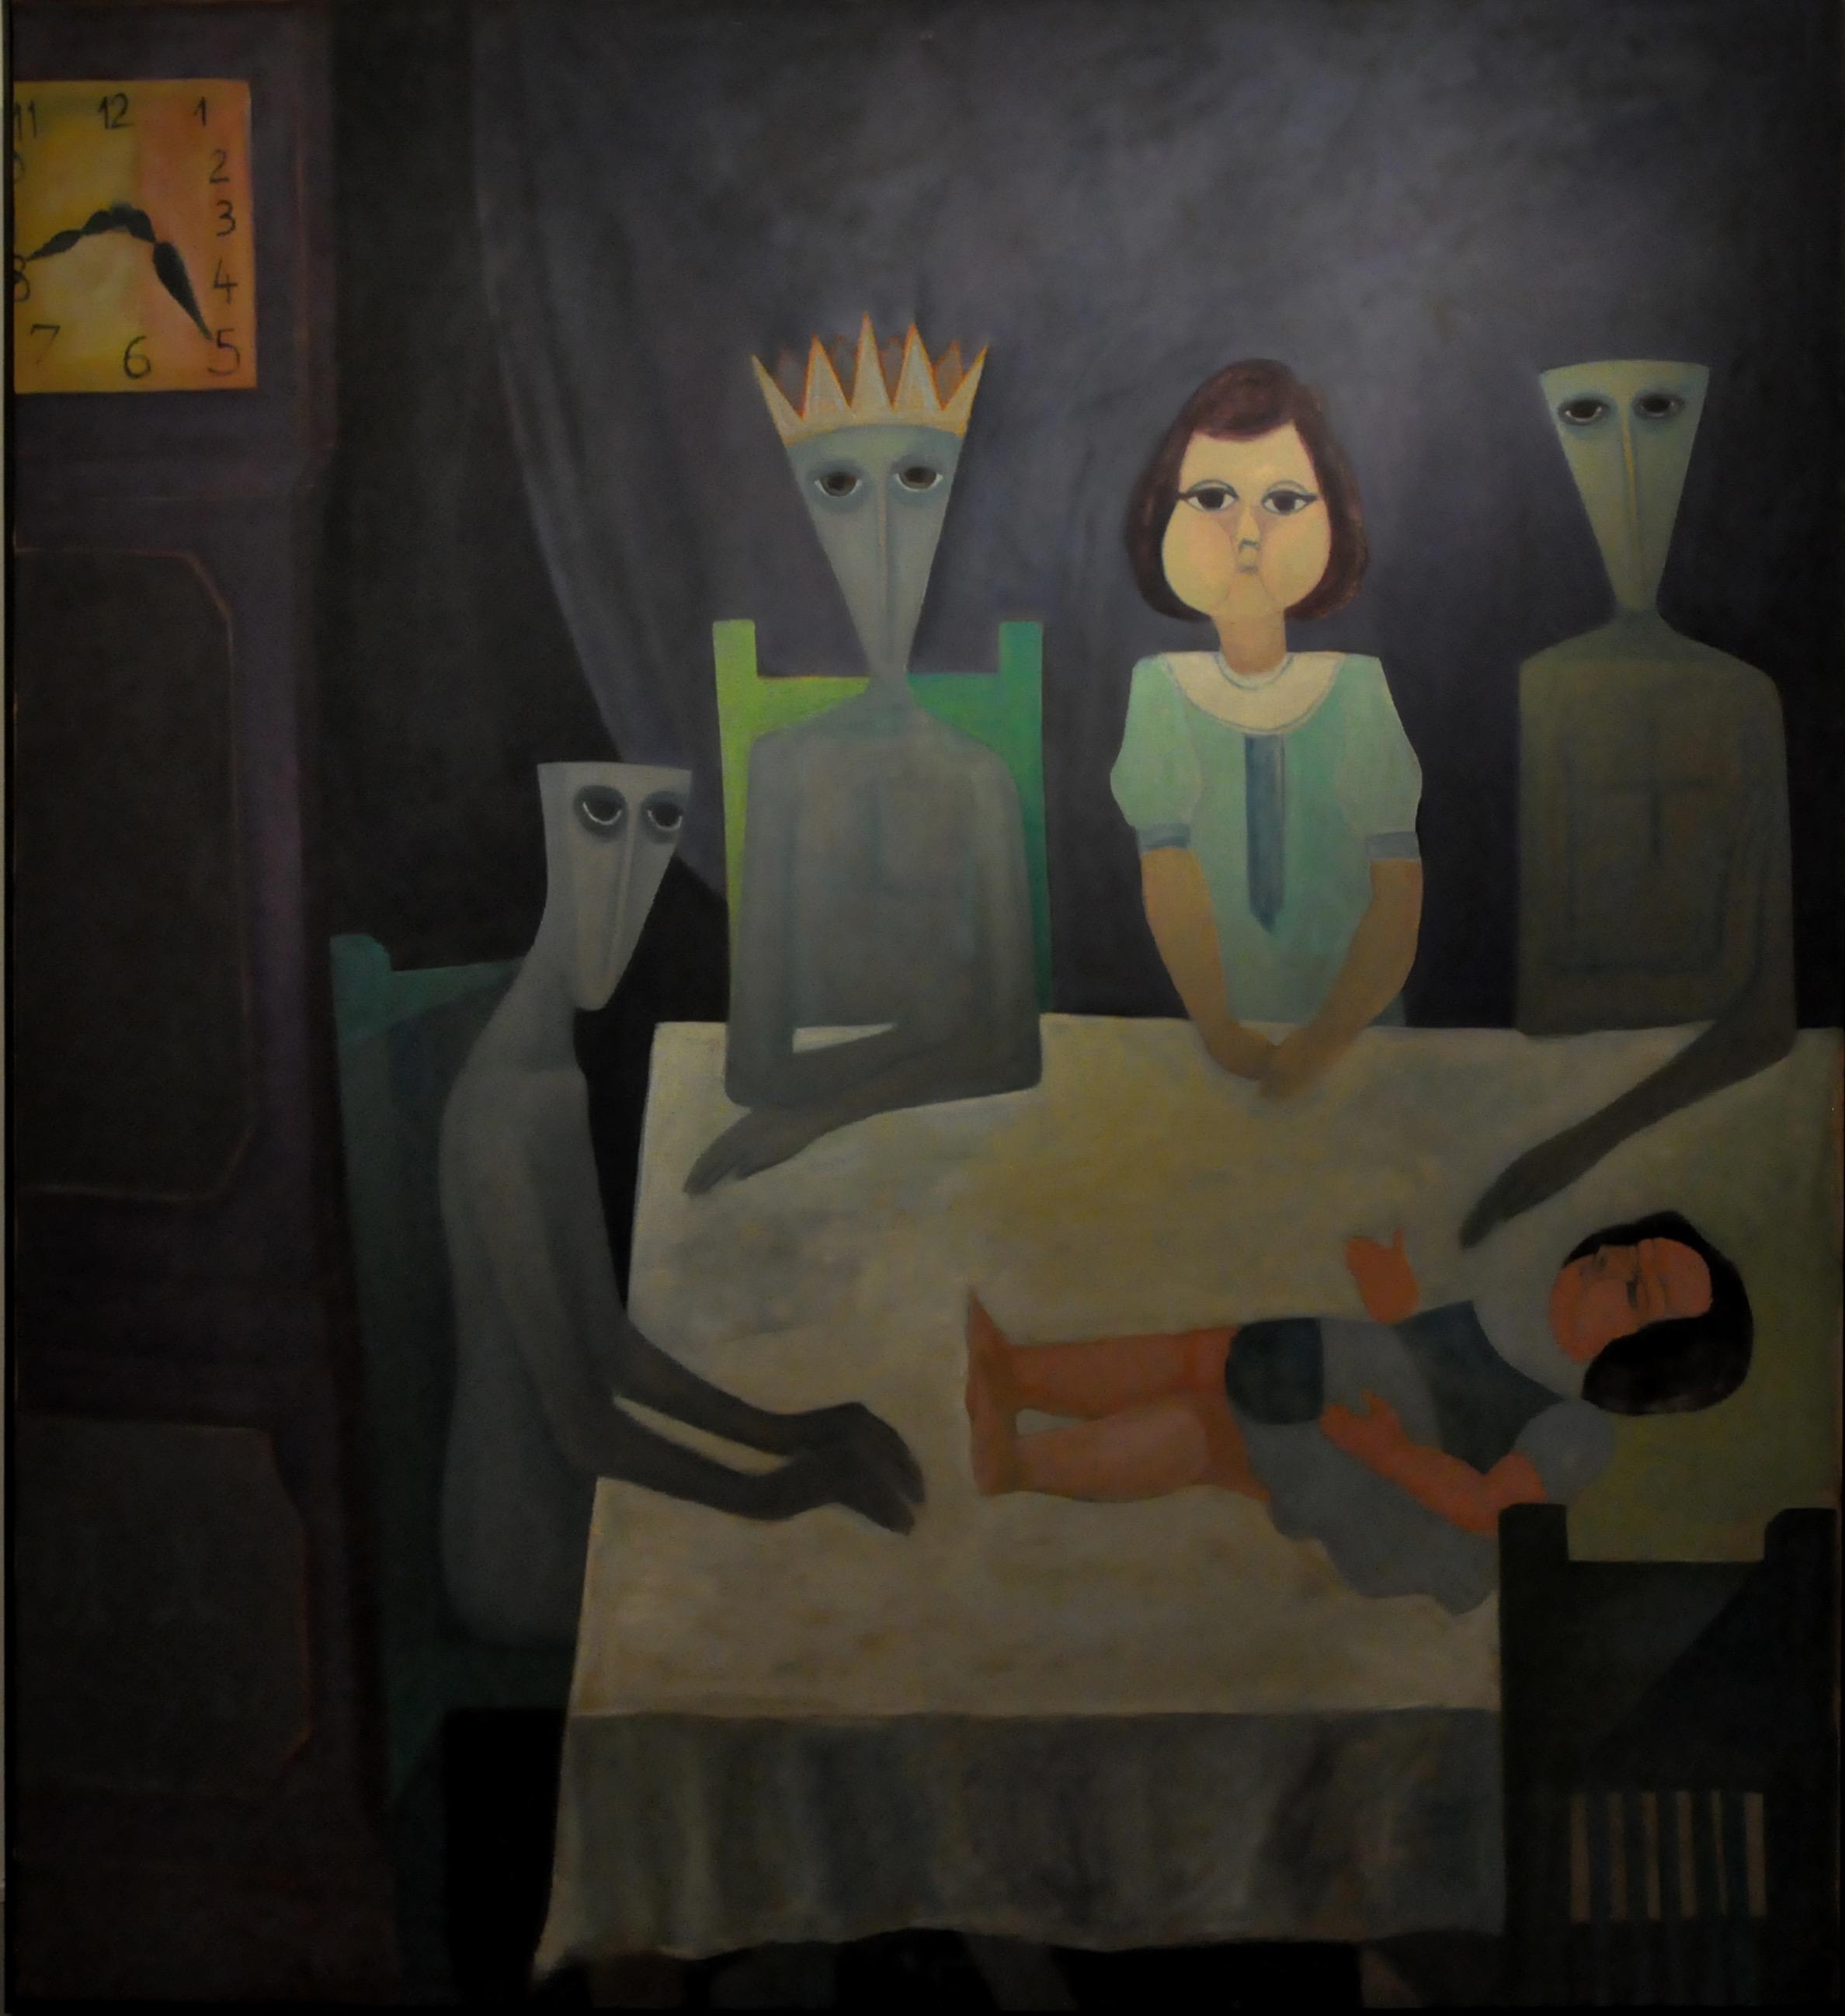 Mathaf: Arab Museum of Modern Art Collection